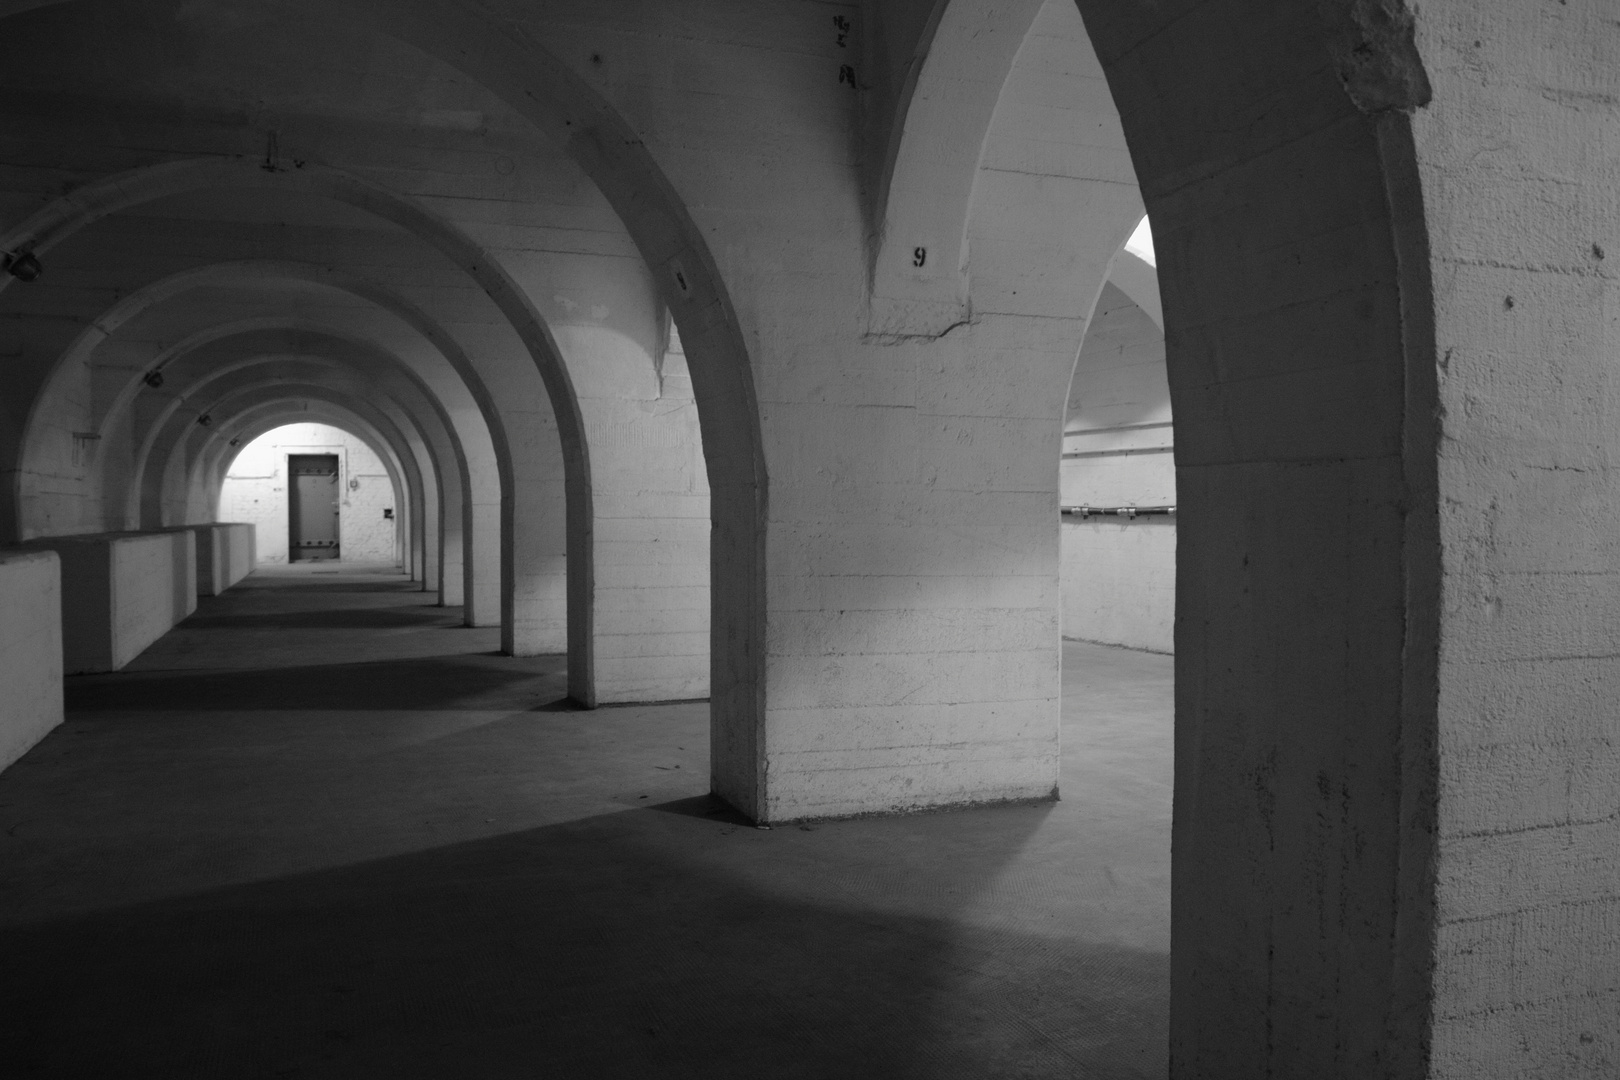 Flughafen Tempelhof Gewölbekeller